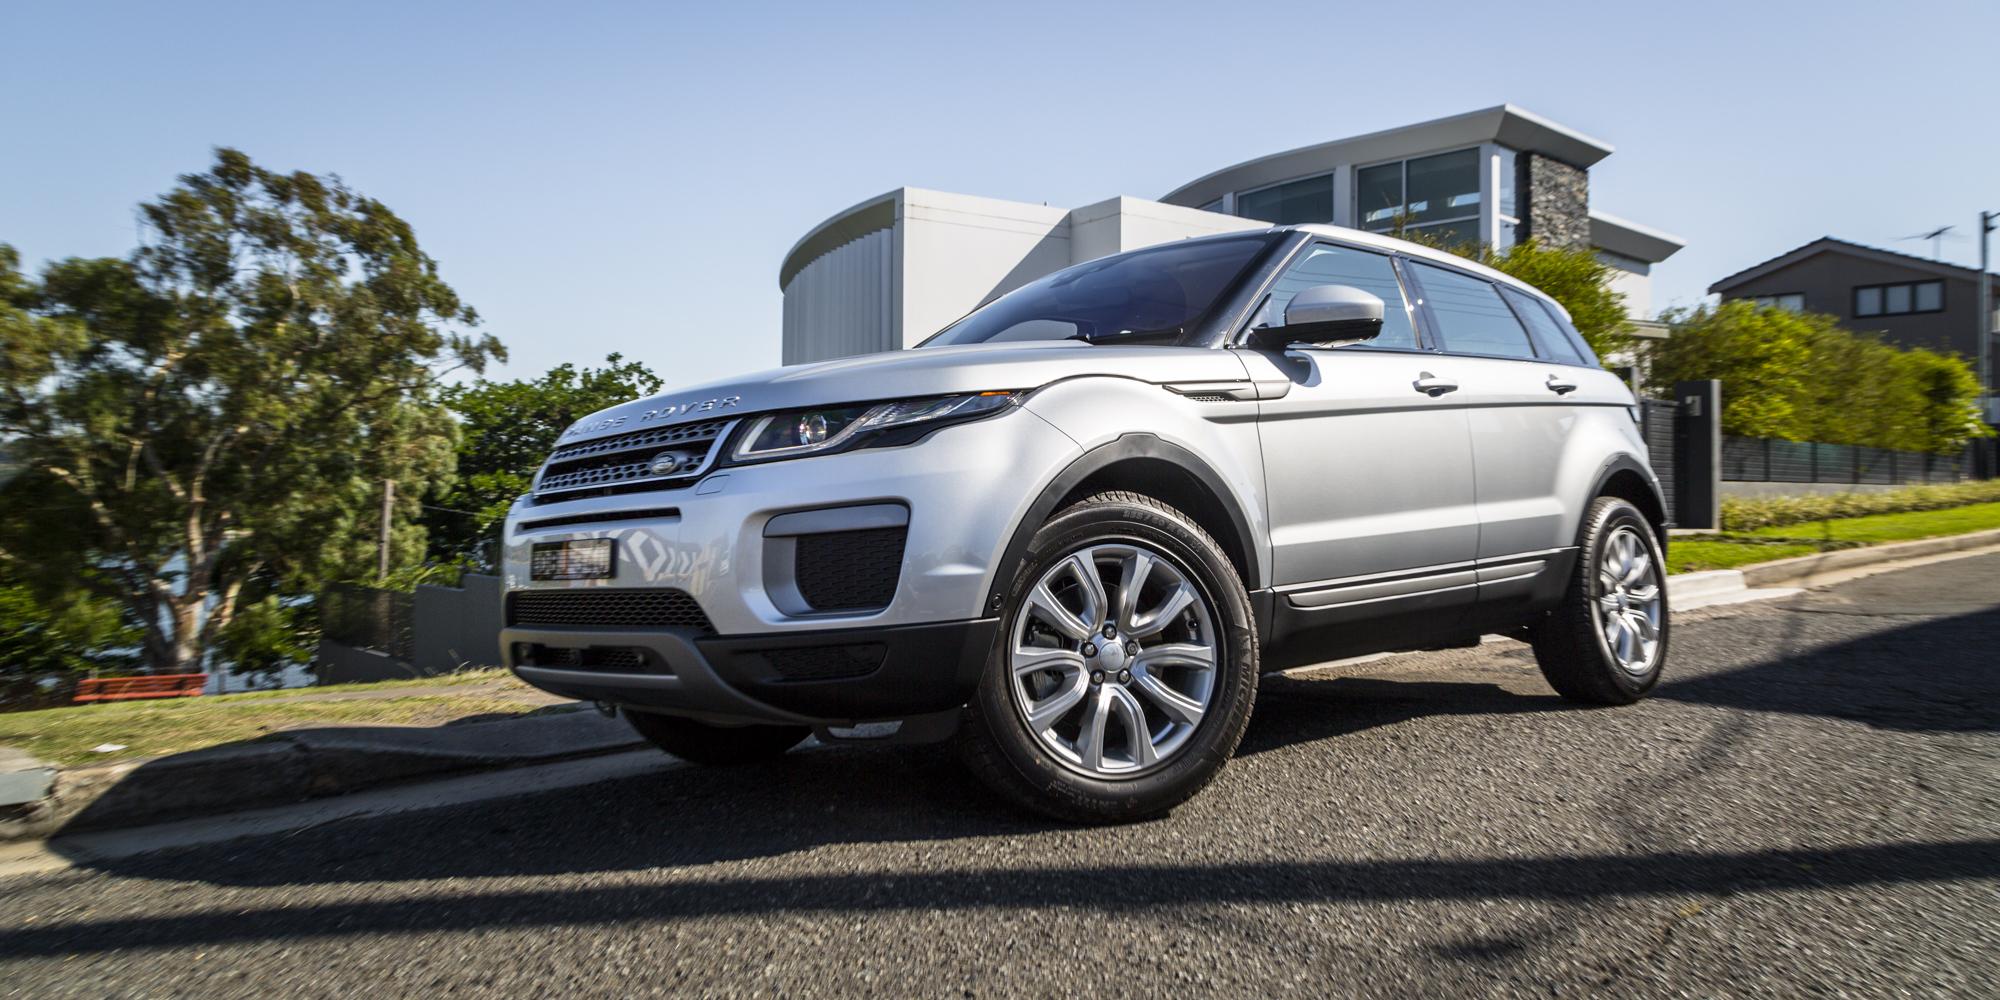 2016 Range Rover Evoque Review   CarAdvice